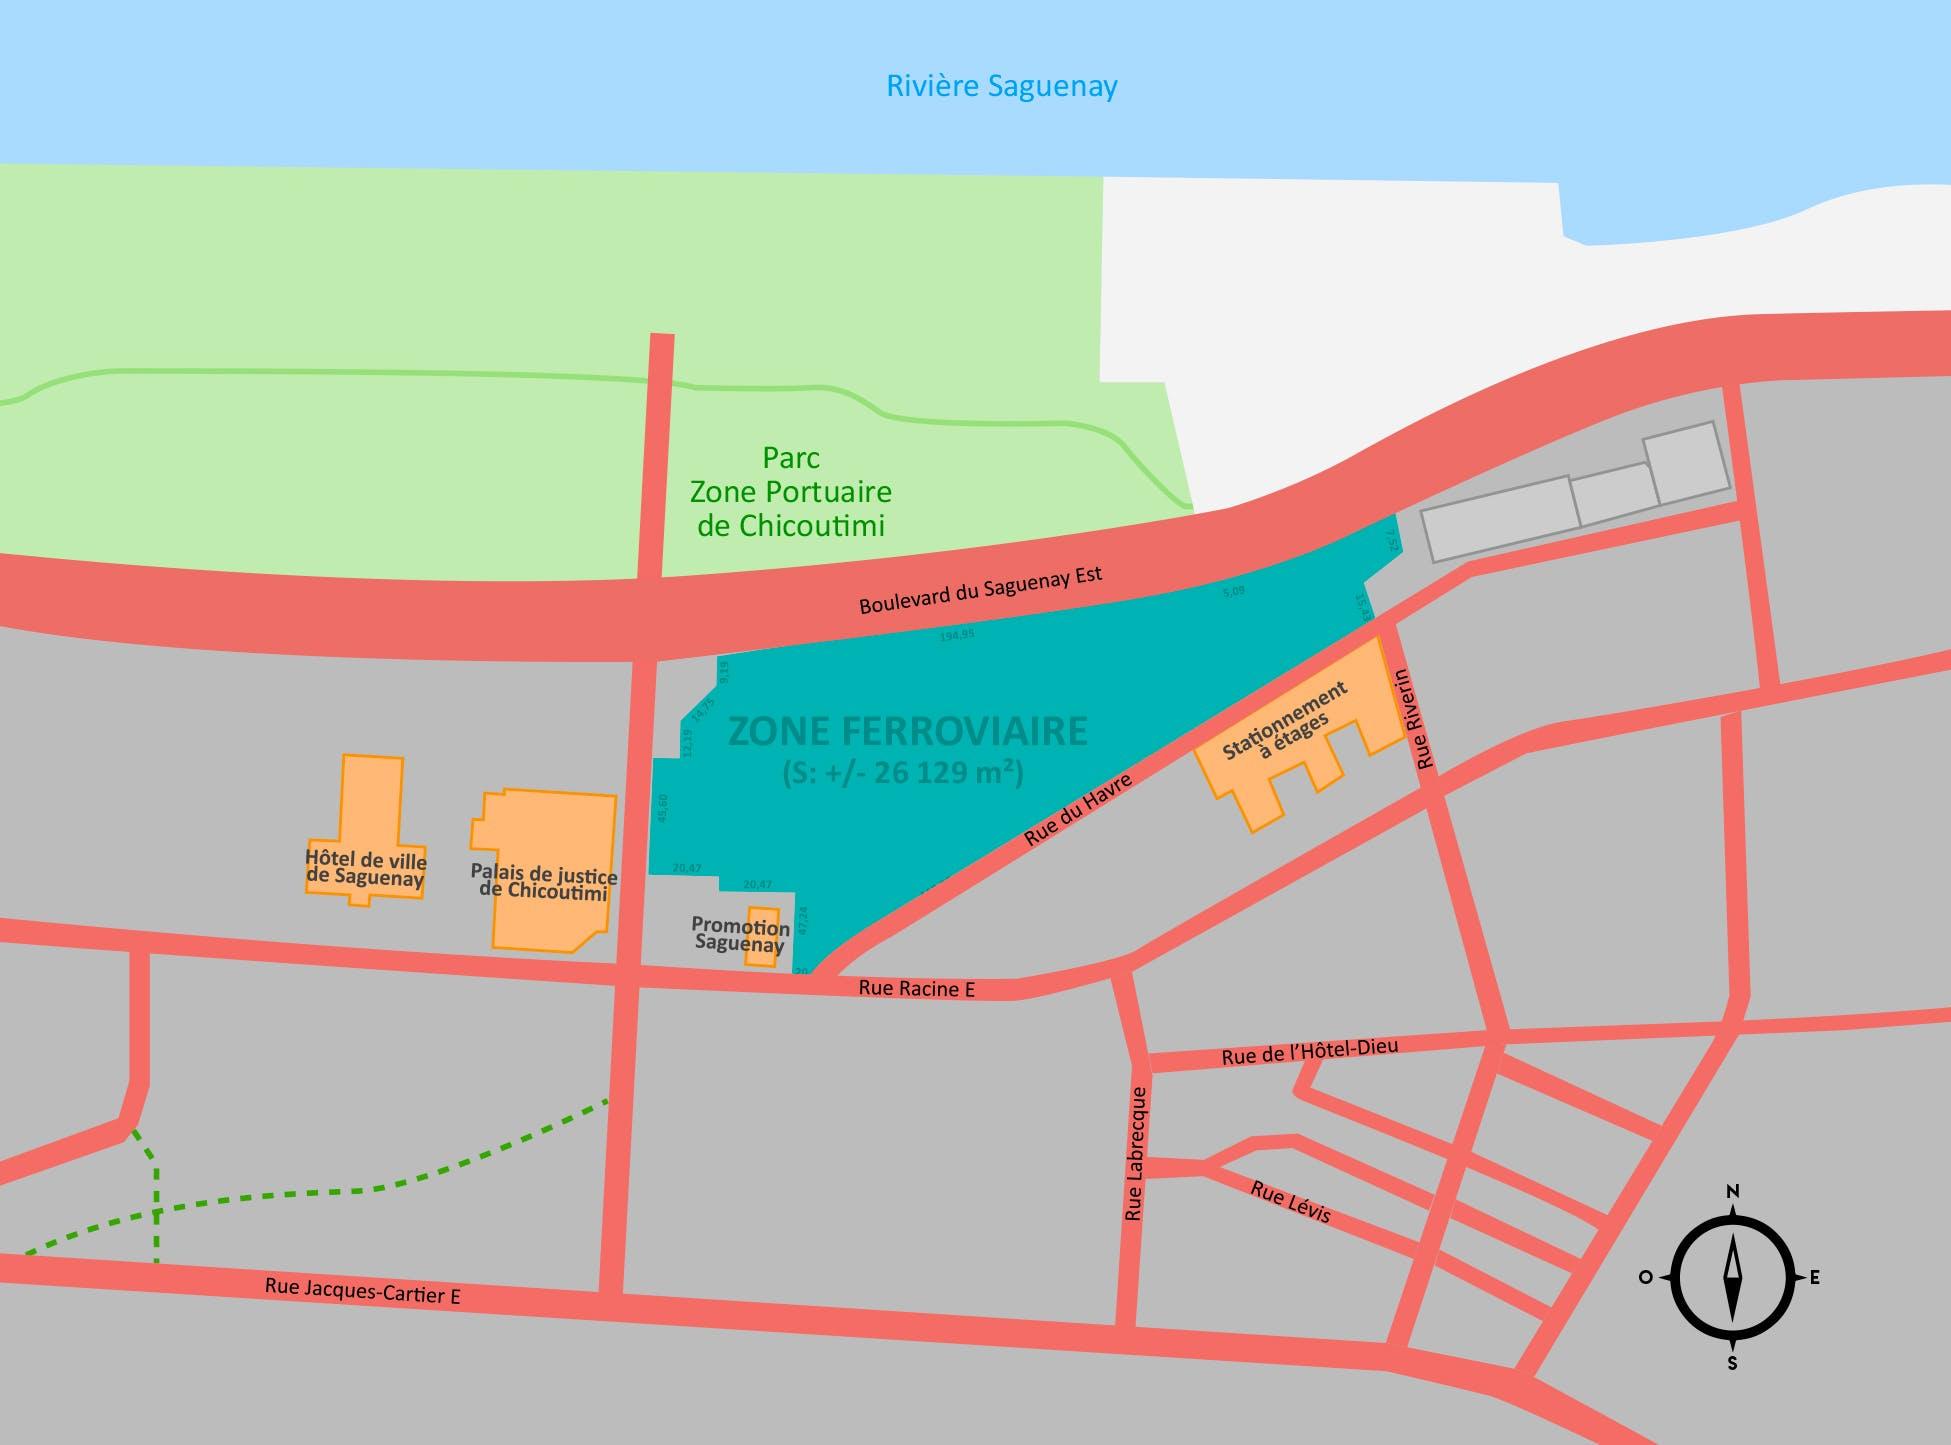 Carte Canada Chicoutimi.Avenir De La Zone Ferroviaire De L Arrondissement De Chicoutimi